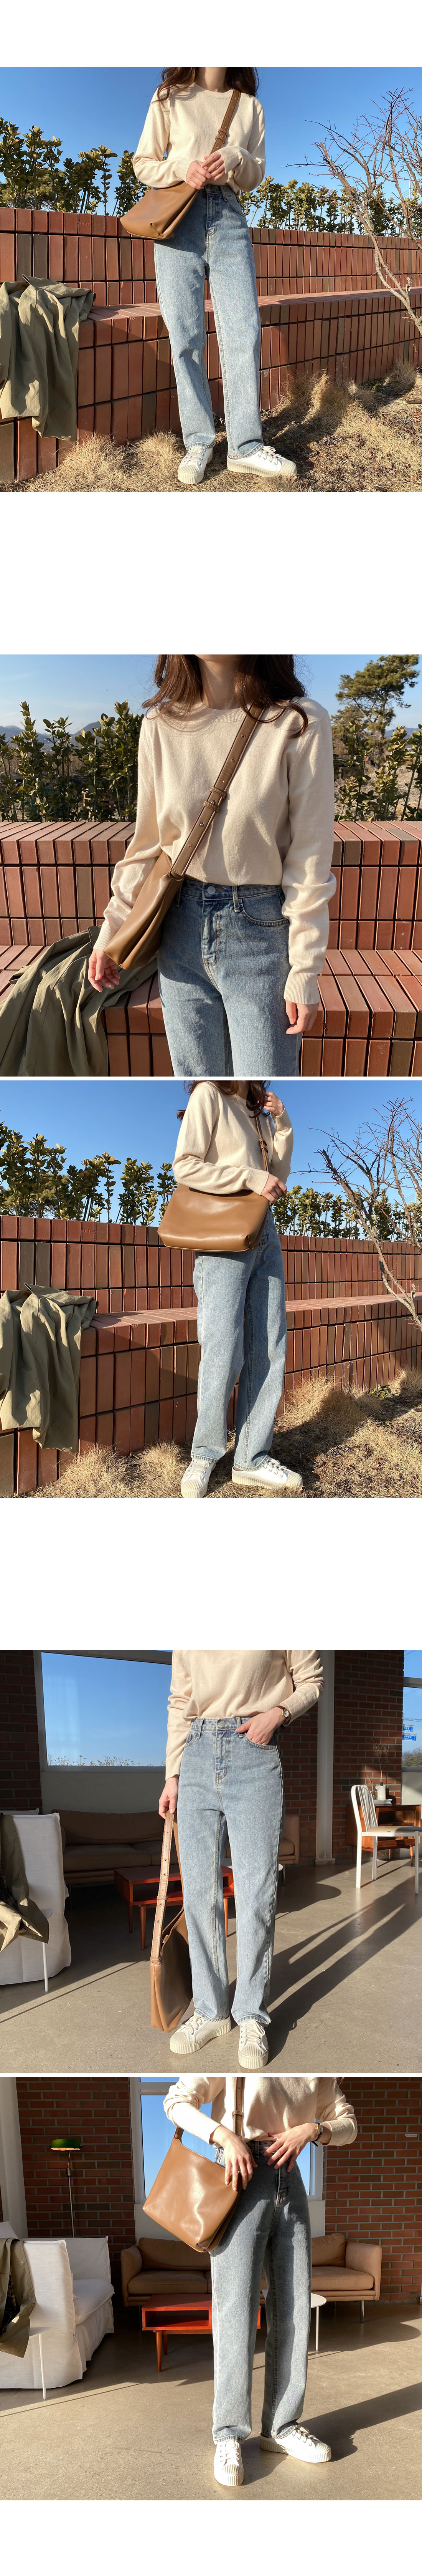 Trip Daily Shoulder Bag